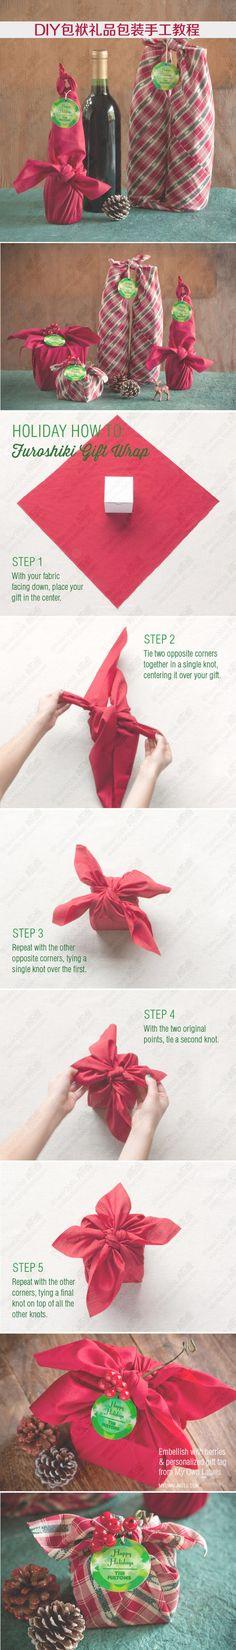 gift wrapped - zzkko.com